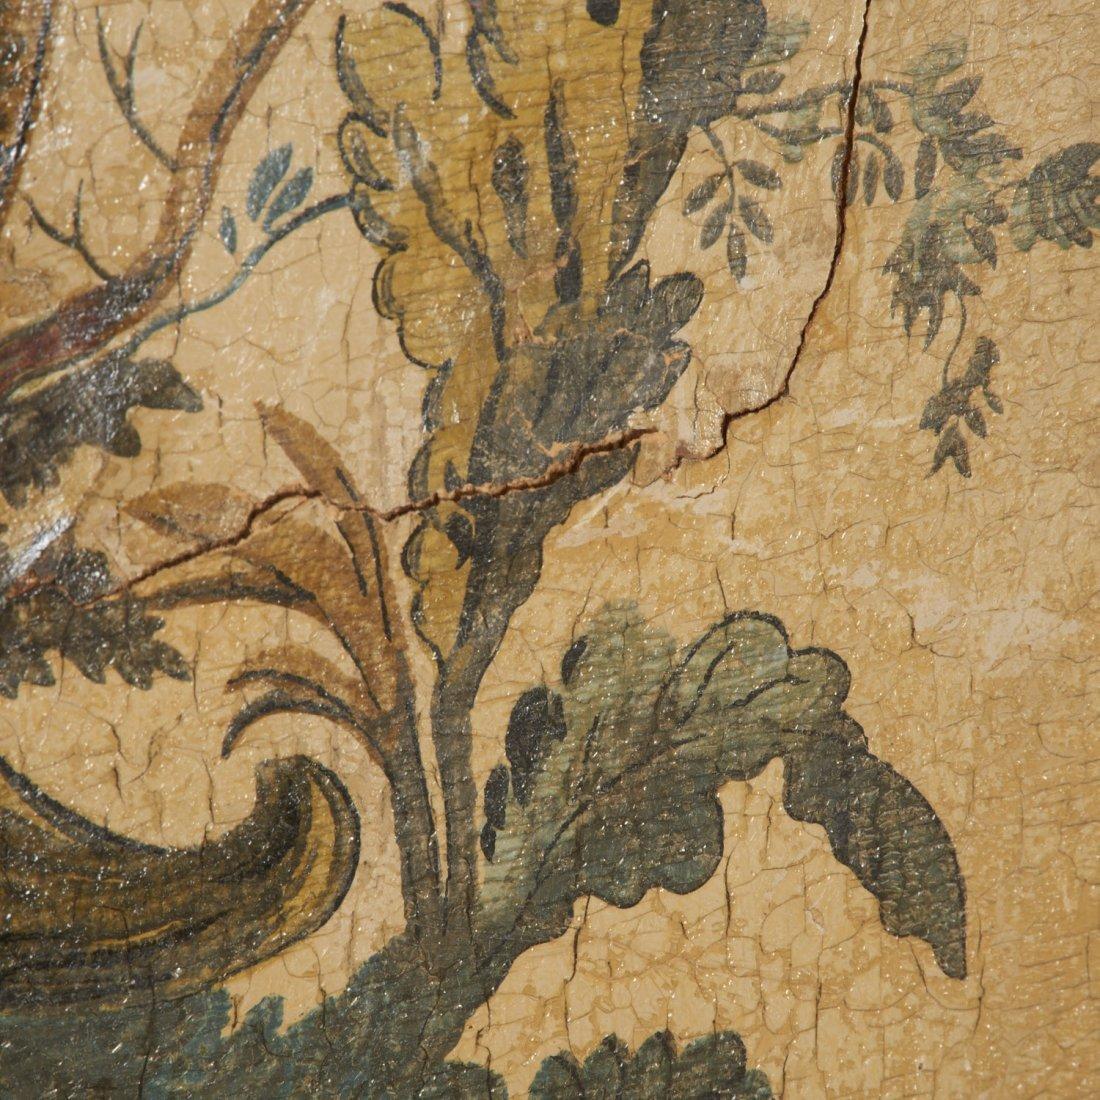 Flemish Chinoiserie hand-painted 4-panel screen - 7